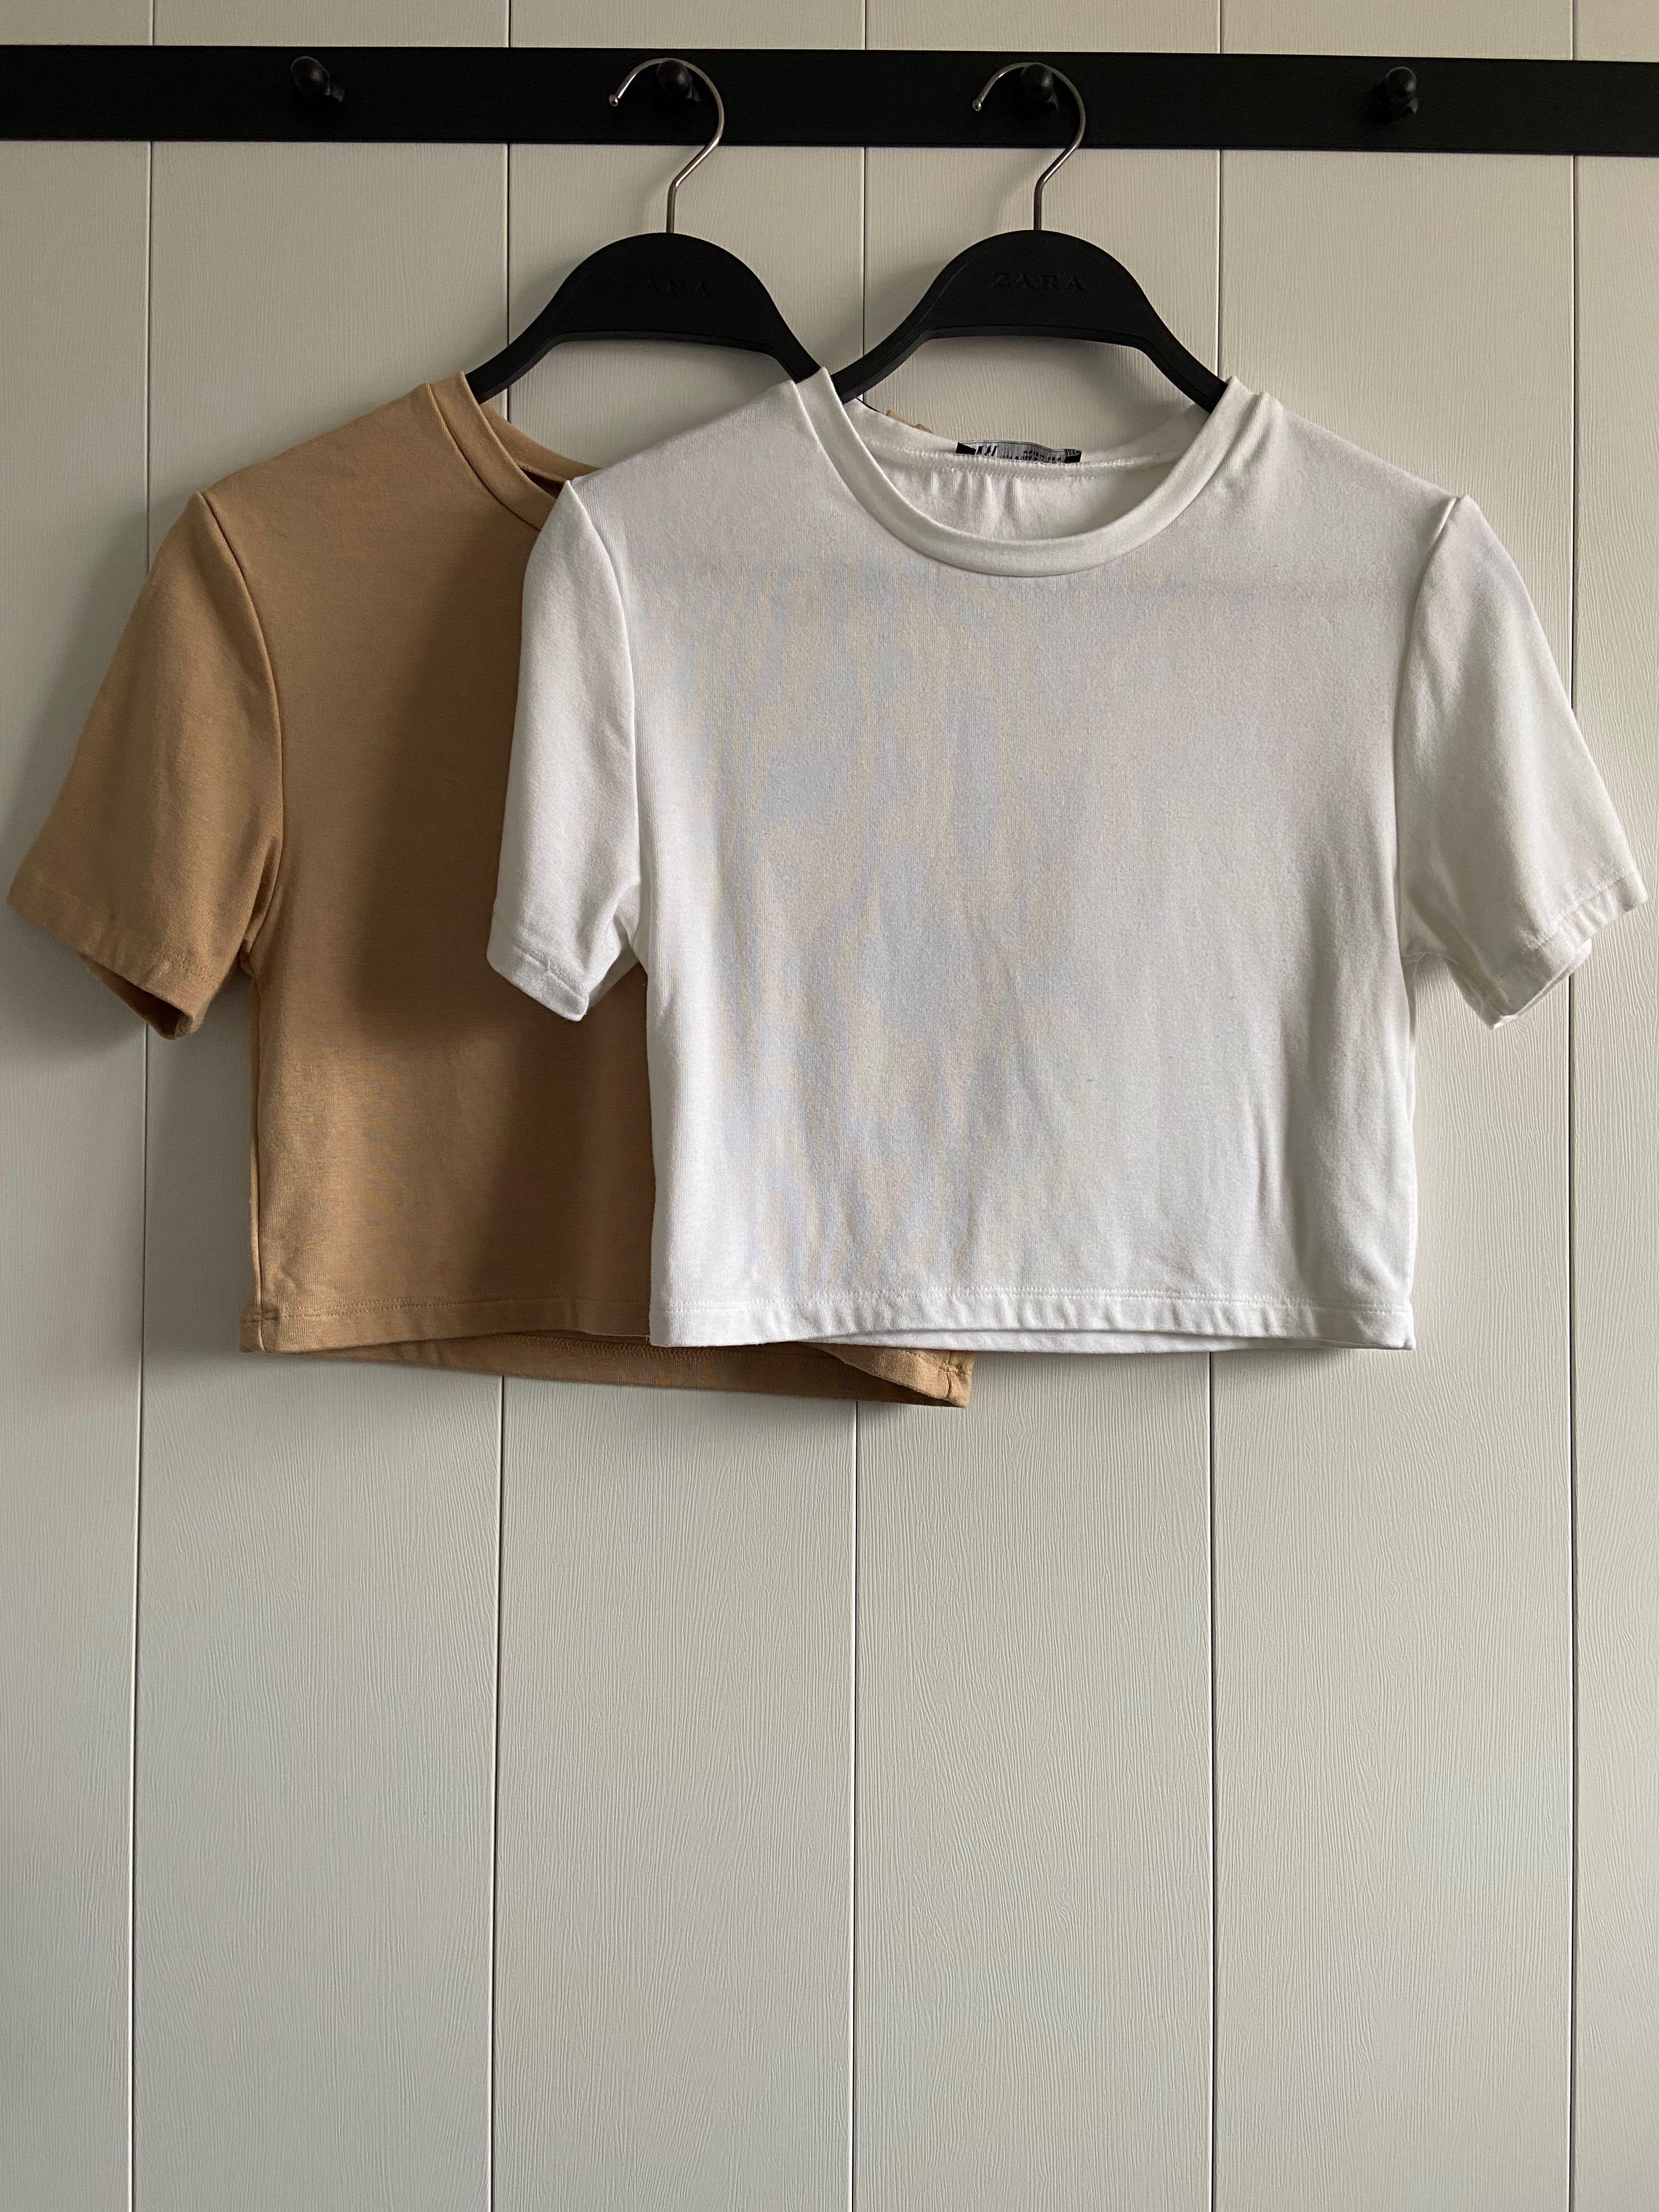 ZARA 2 shirt bundle